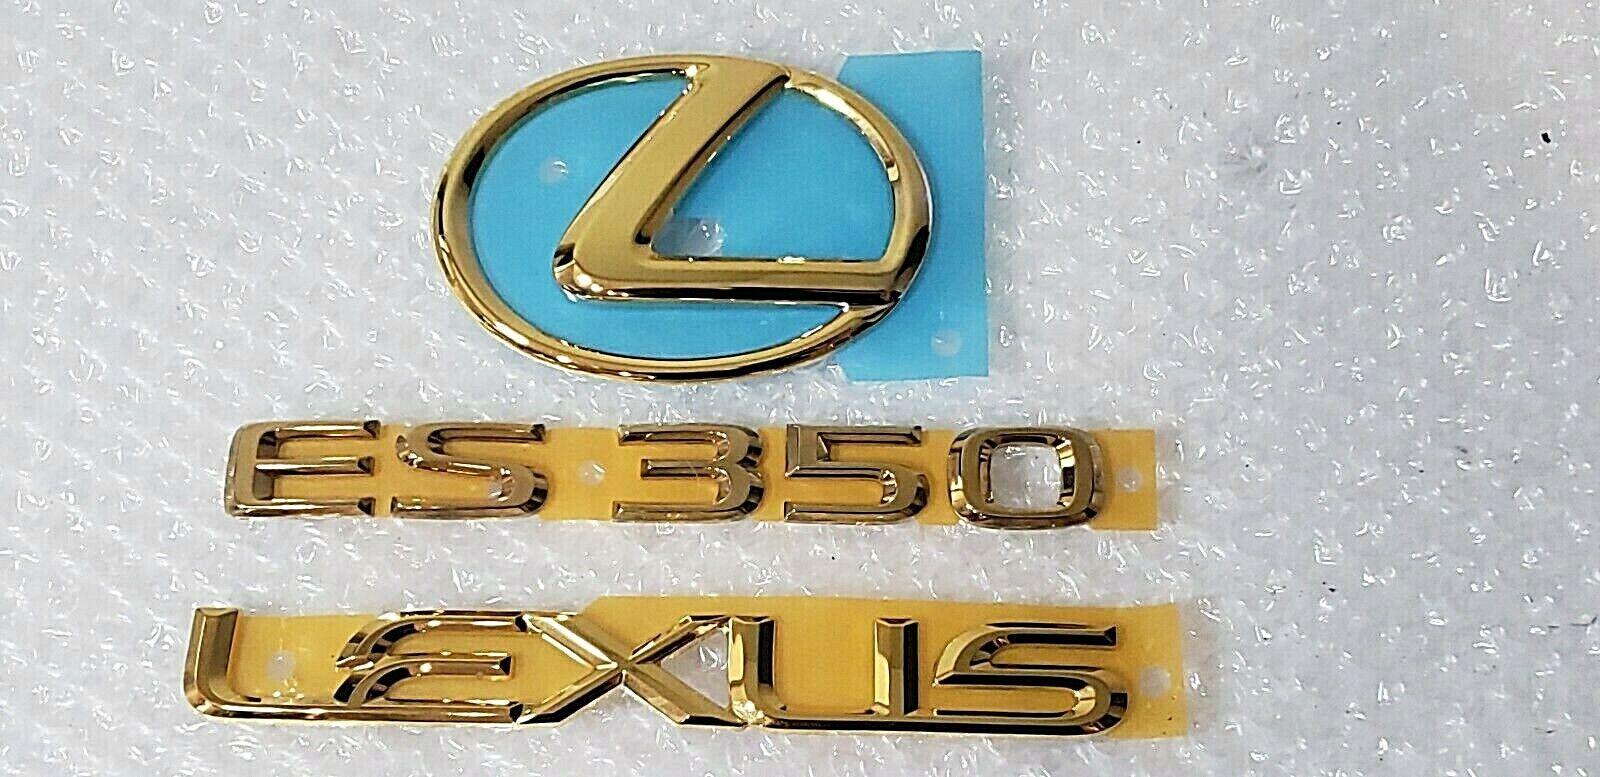 FOR 2010 LEXUS 24KT GOLD PLATED GX460 EMBLEM KIT